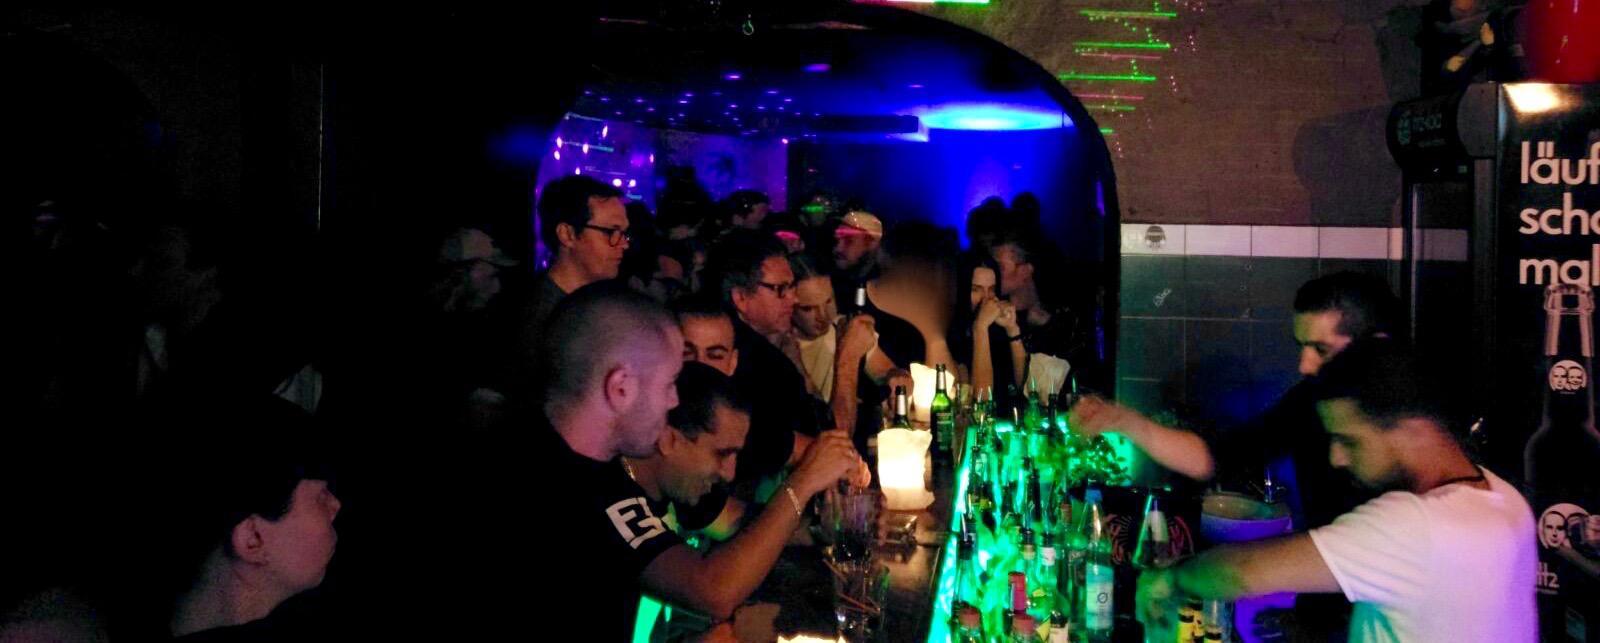 Berlin PR & Marketing Event Bar/Nachtclub/Lounge Kara Kas Bar image 10